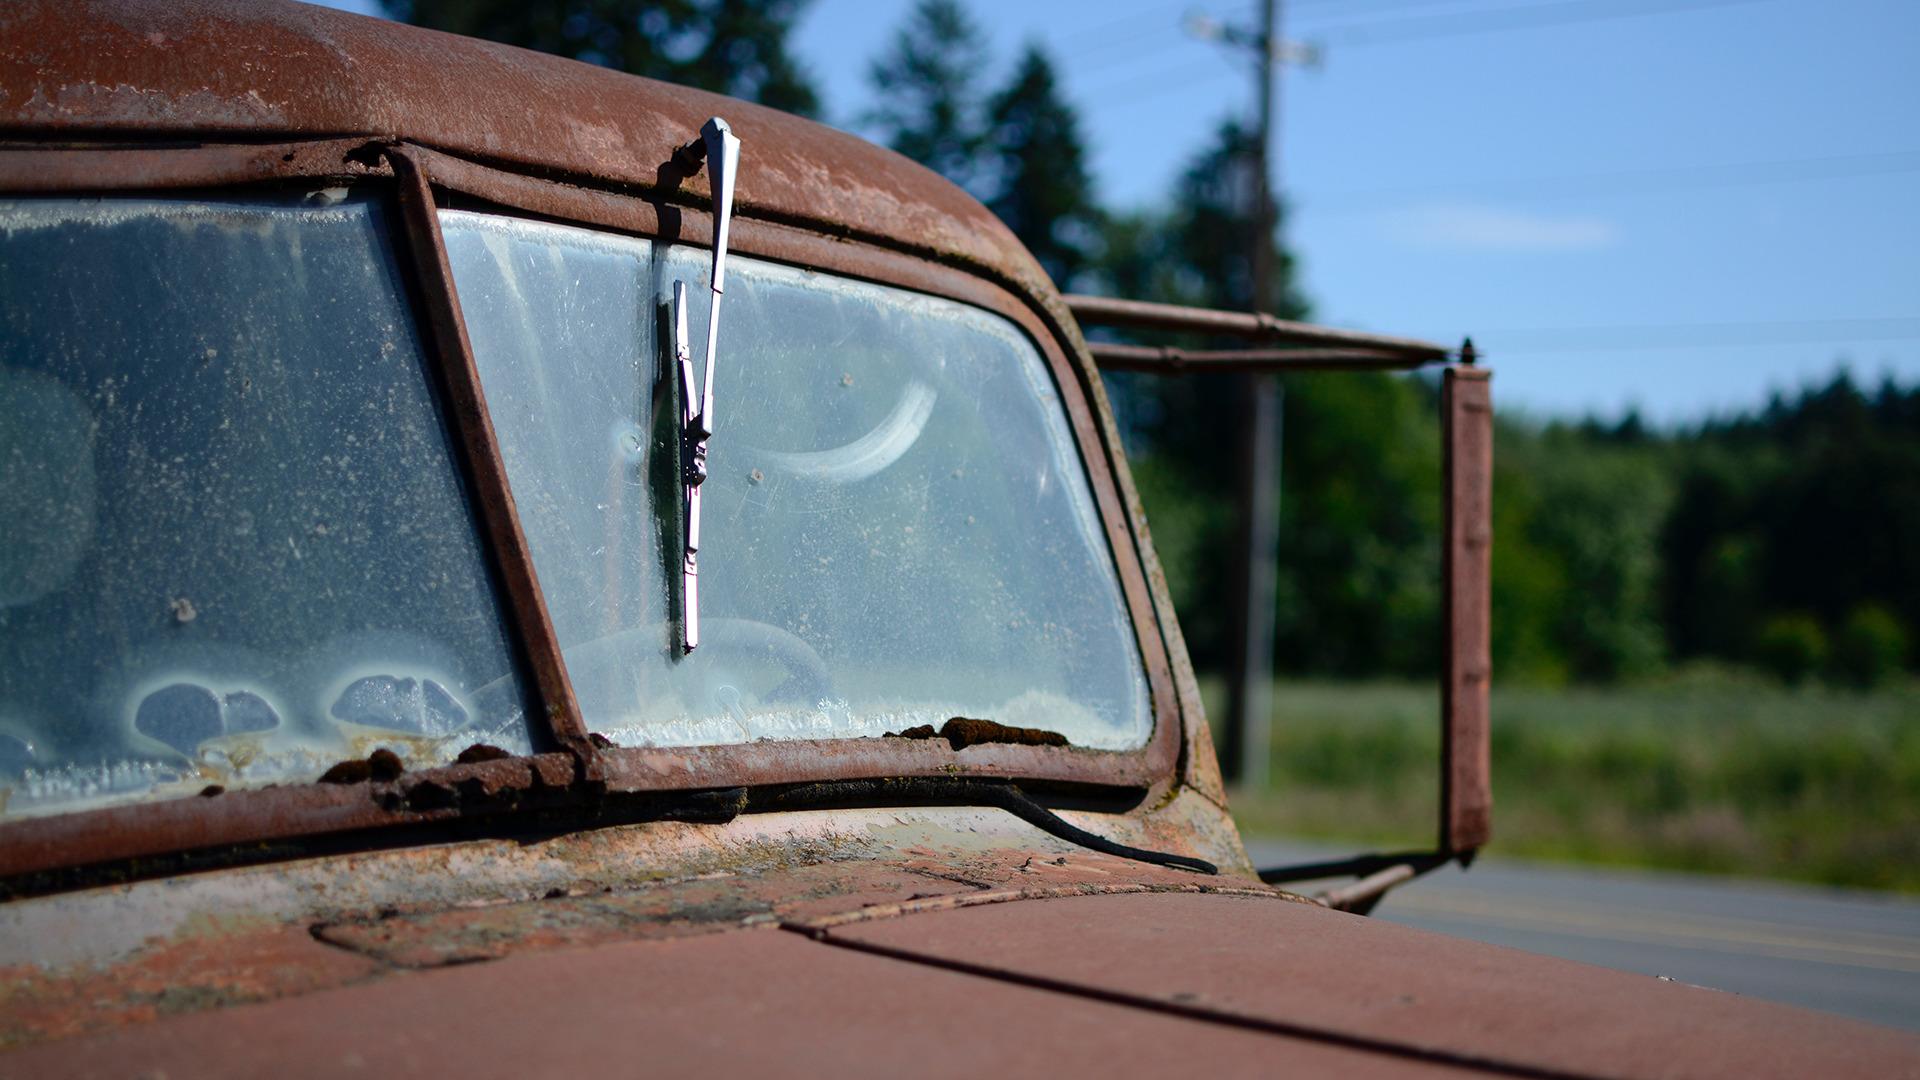 19 windshield wiper passiton